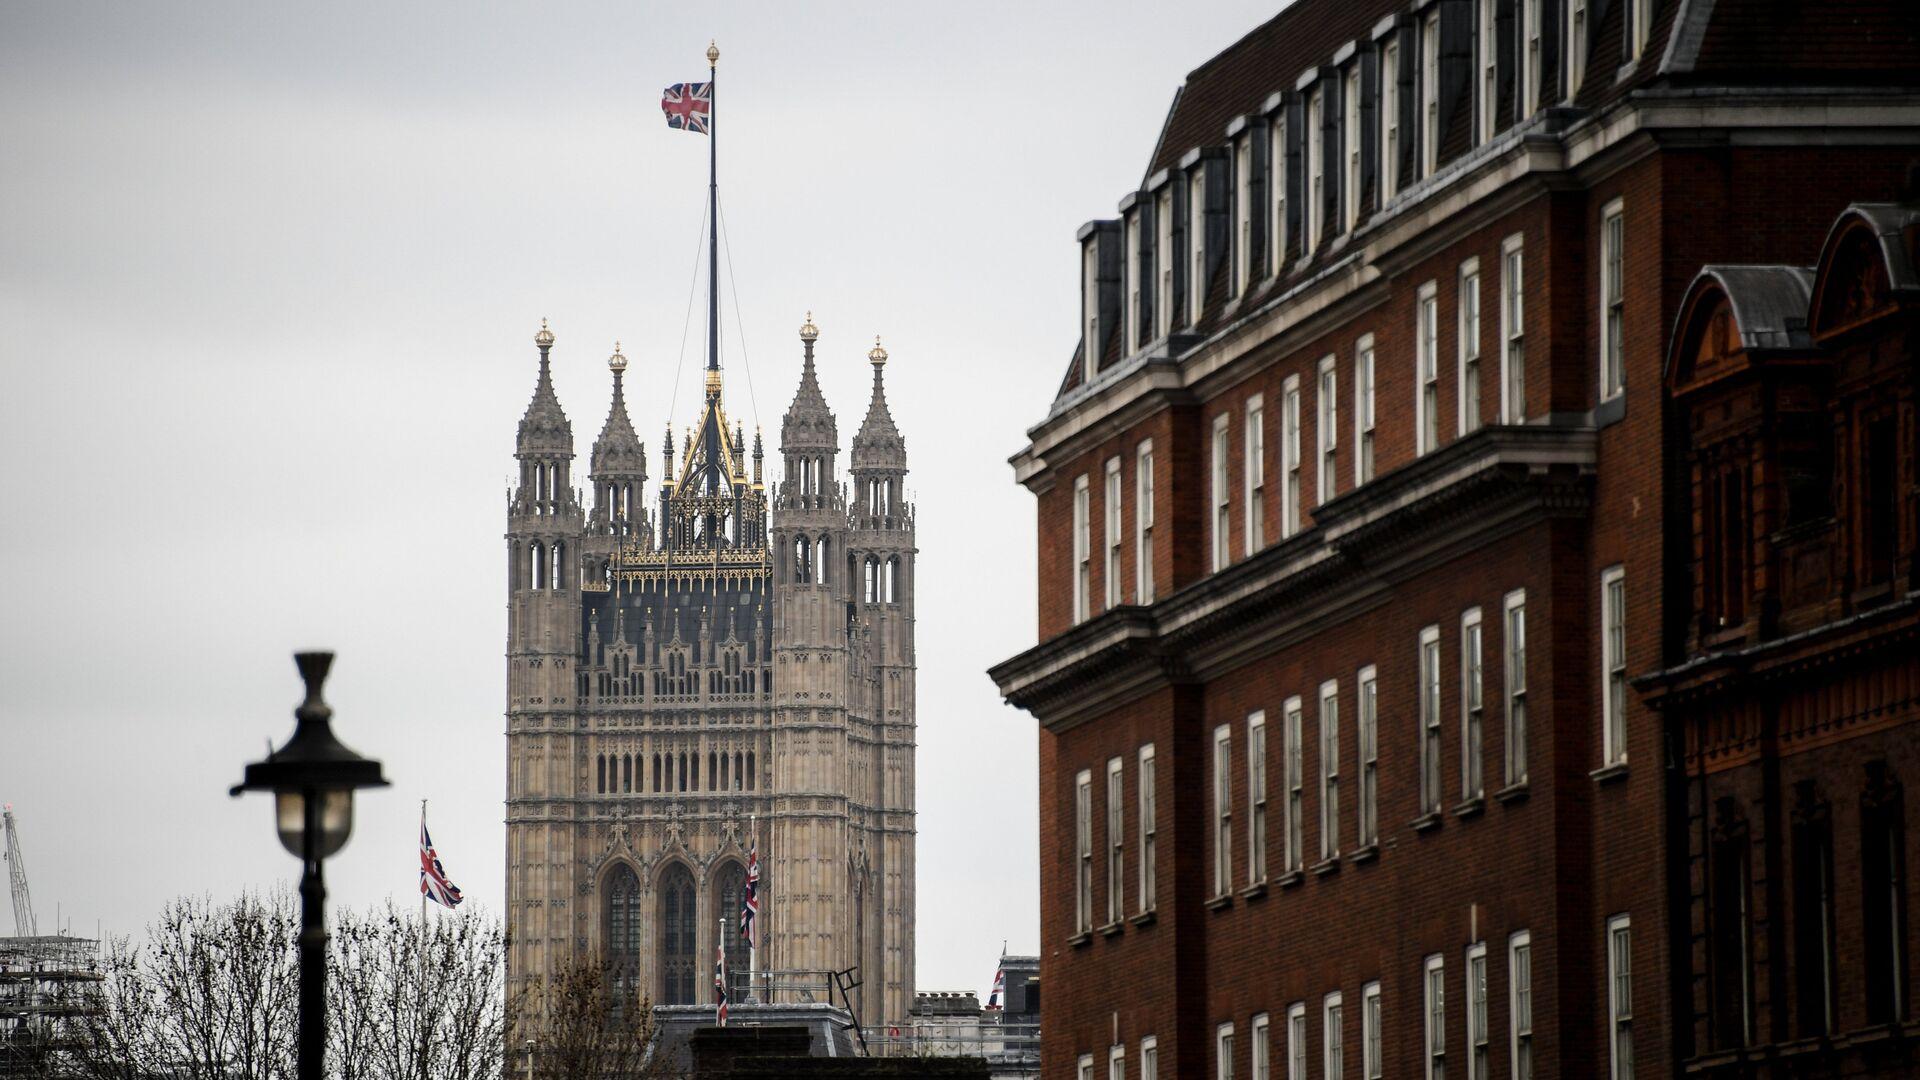 Башня Виктории Вестминстерского дворца в Лондоне - РИА Новости, 1920, 29.03.2021